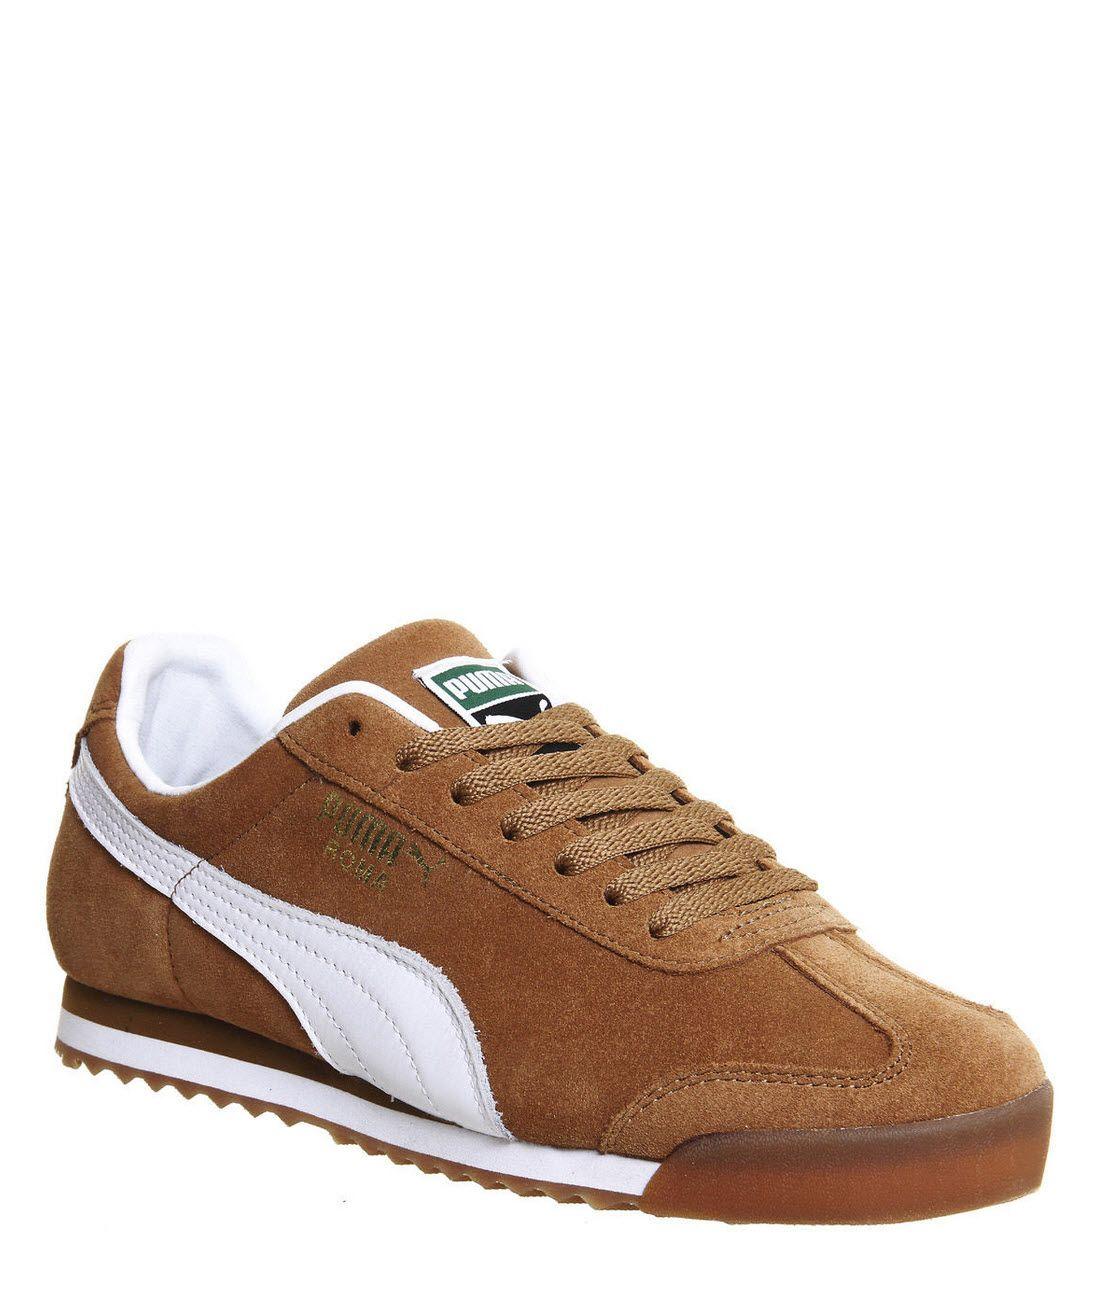 Puma Roma: Chestnut Brown. Men's ShoesMen's ...